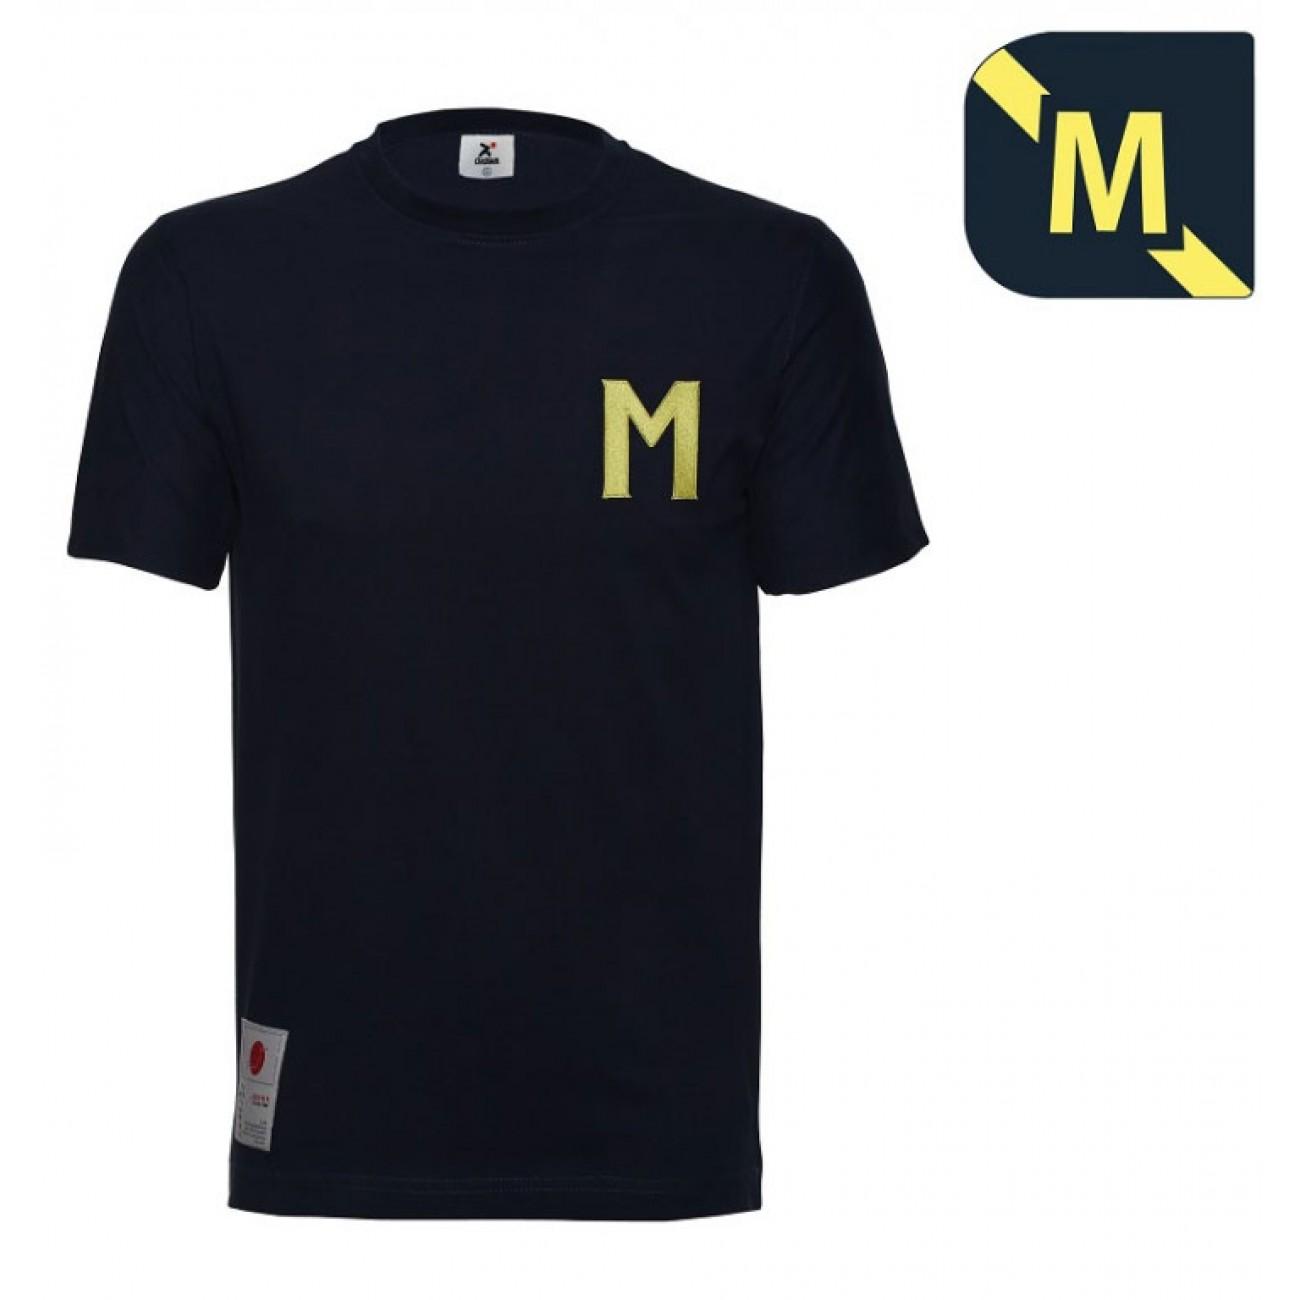 http://www.retrofootball.es/ropa-de-futbol/camiseta-meiwa.html